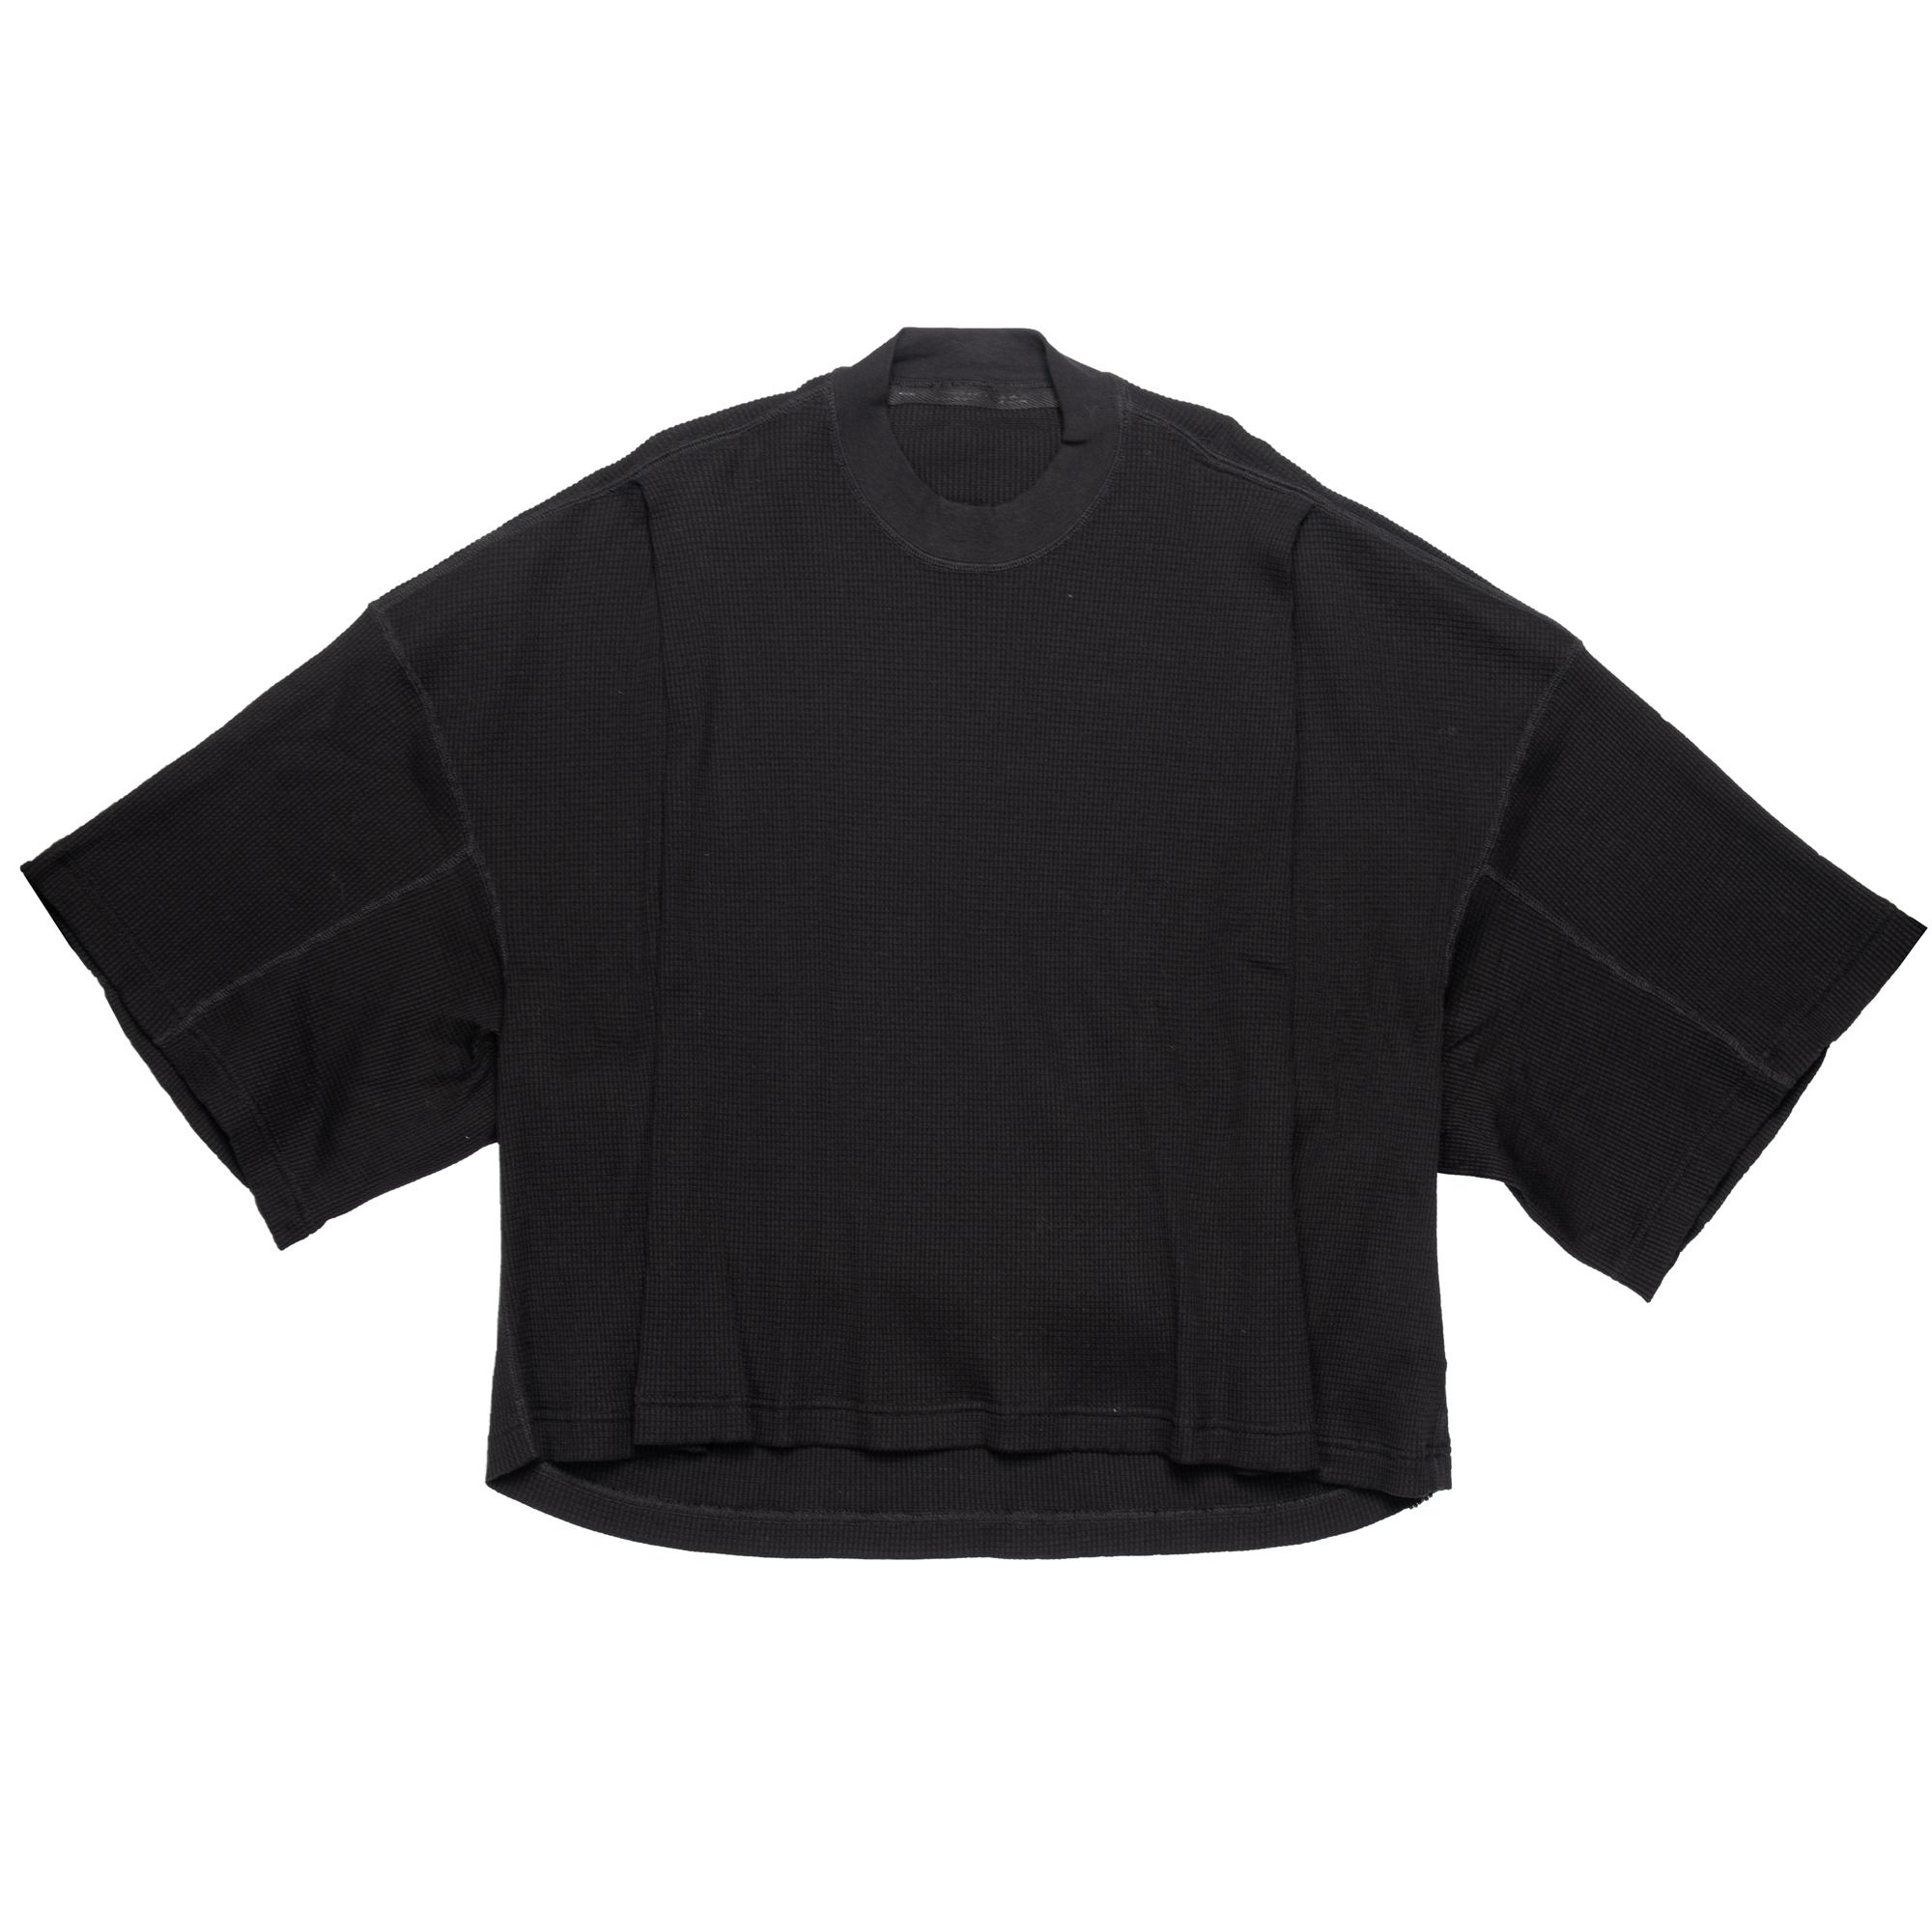 657CPM21-BLACK / タックド ボックスTシャツ